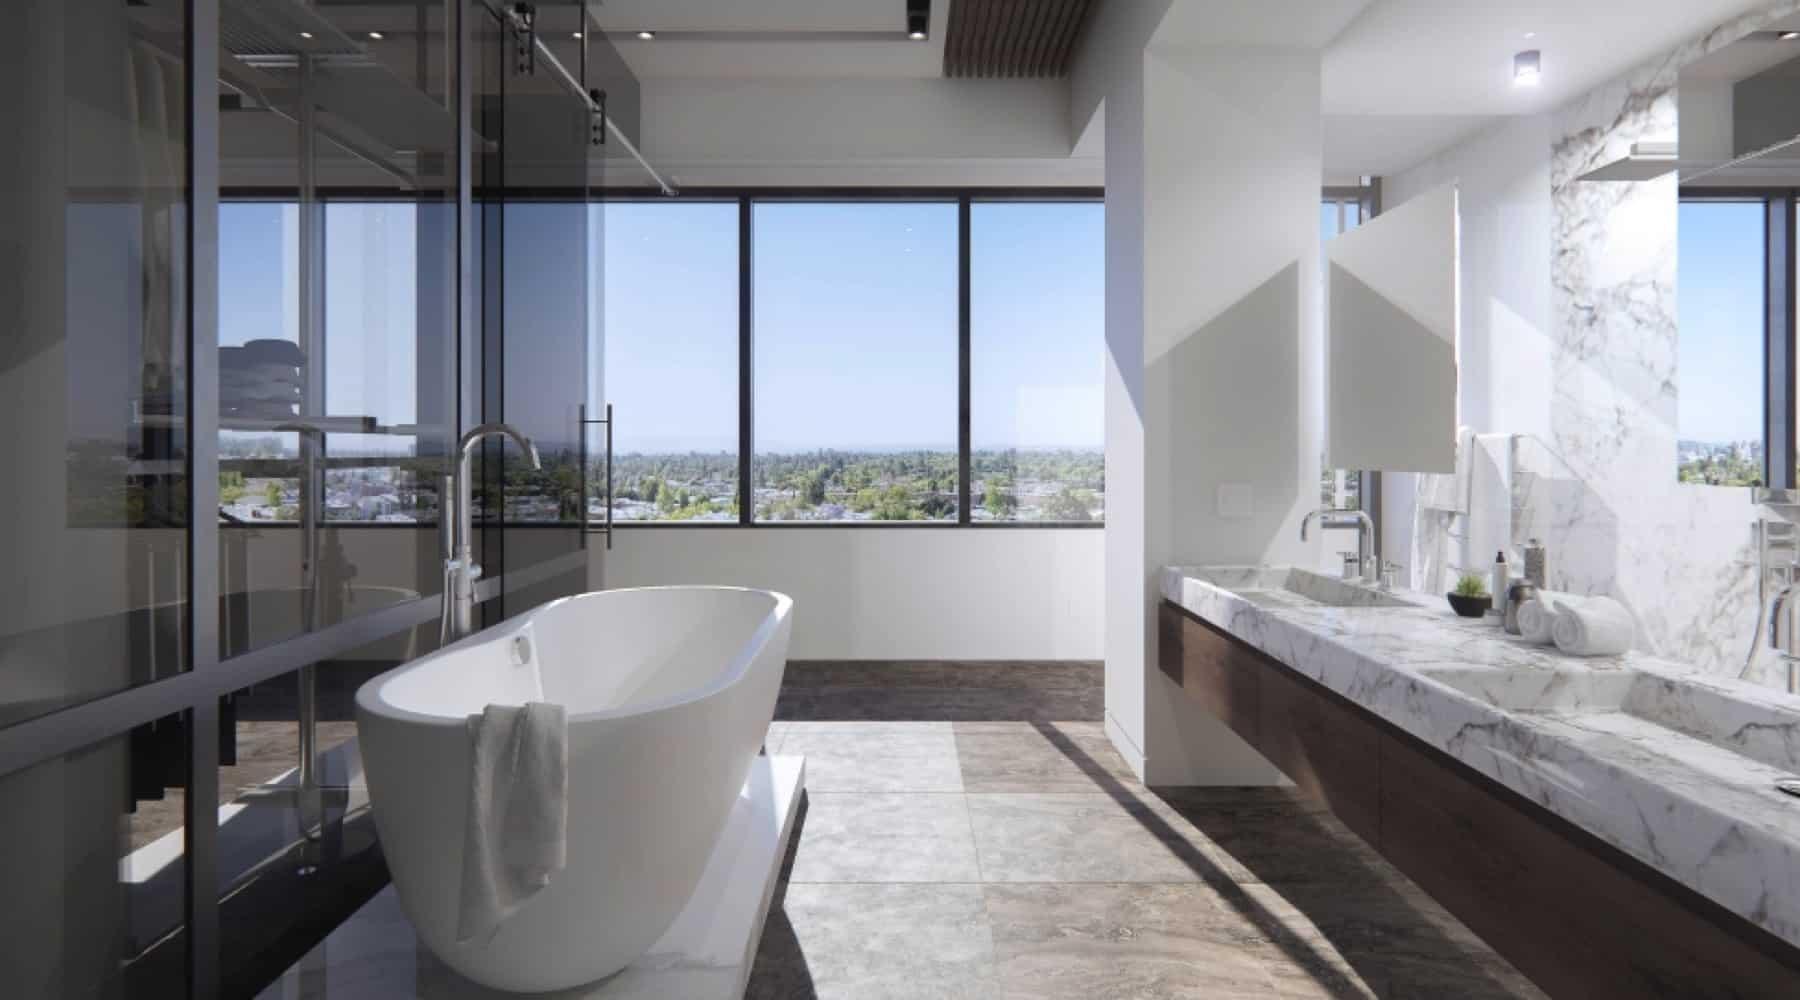 Penthouse_2_Rendering_Bath